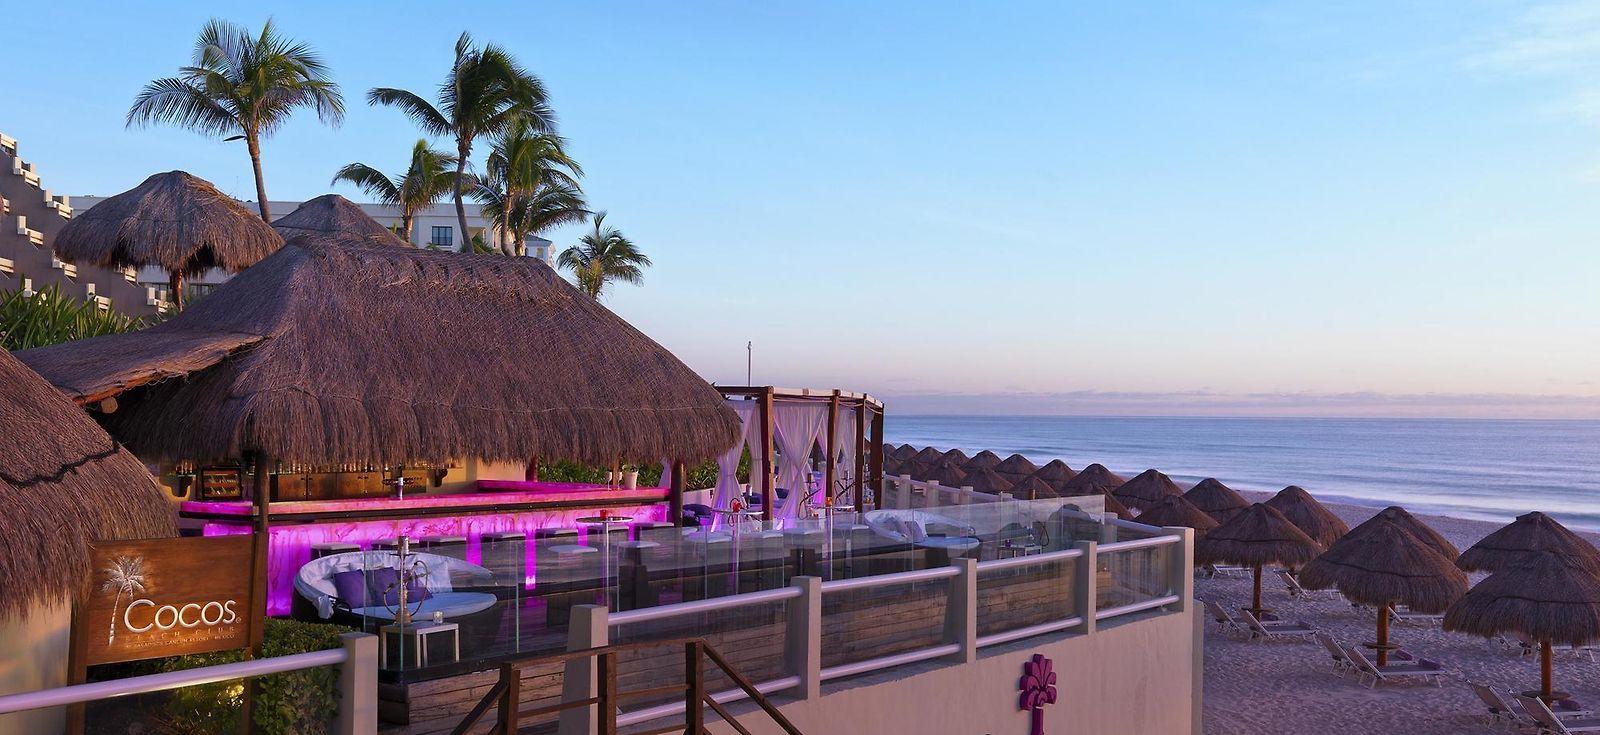 Adhara Hacienda Cancun Hotel Hotel Royal Service By Paradisus Cancun Cancun